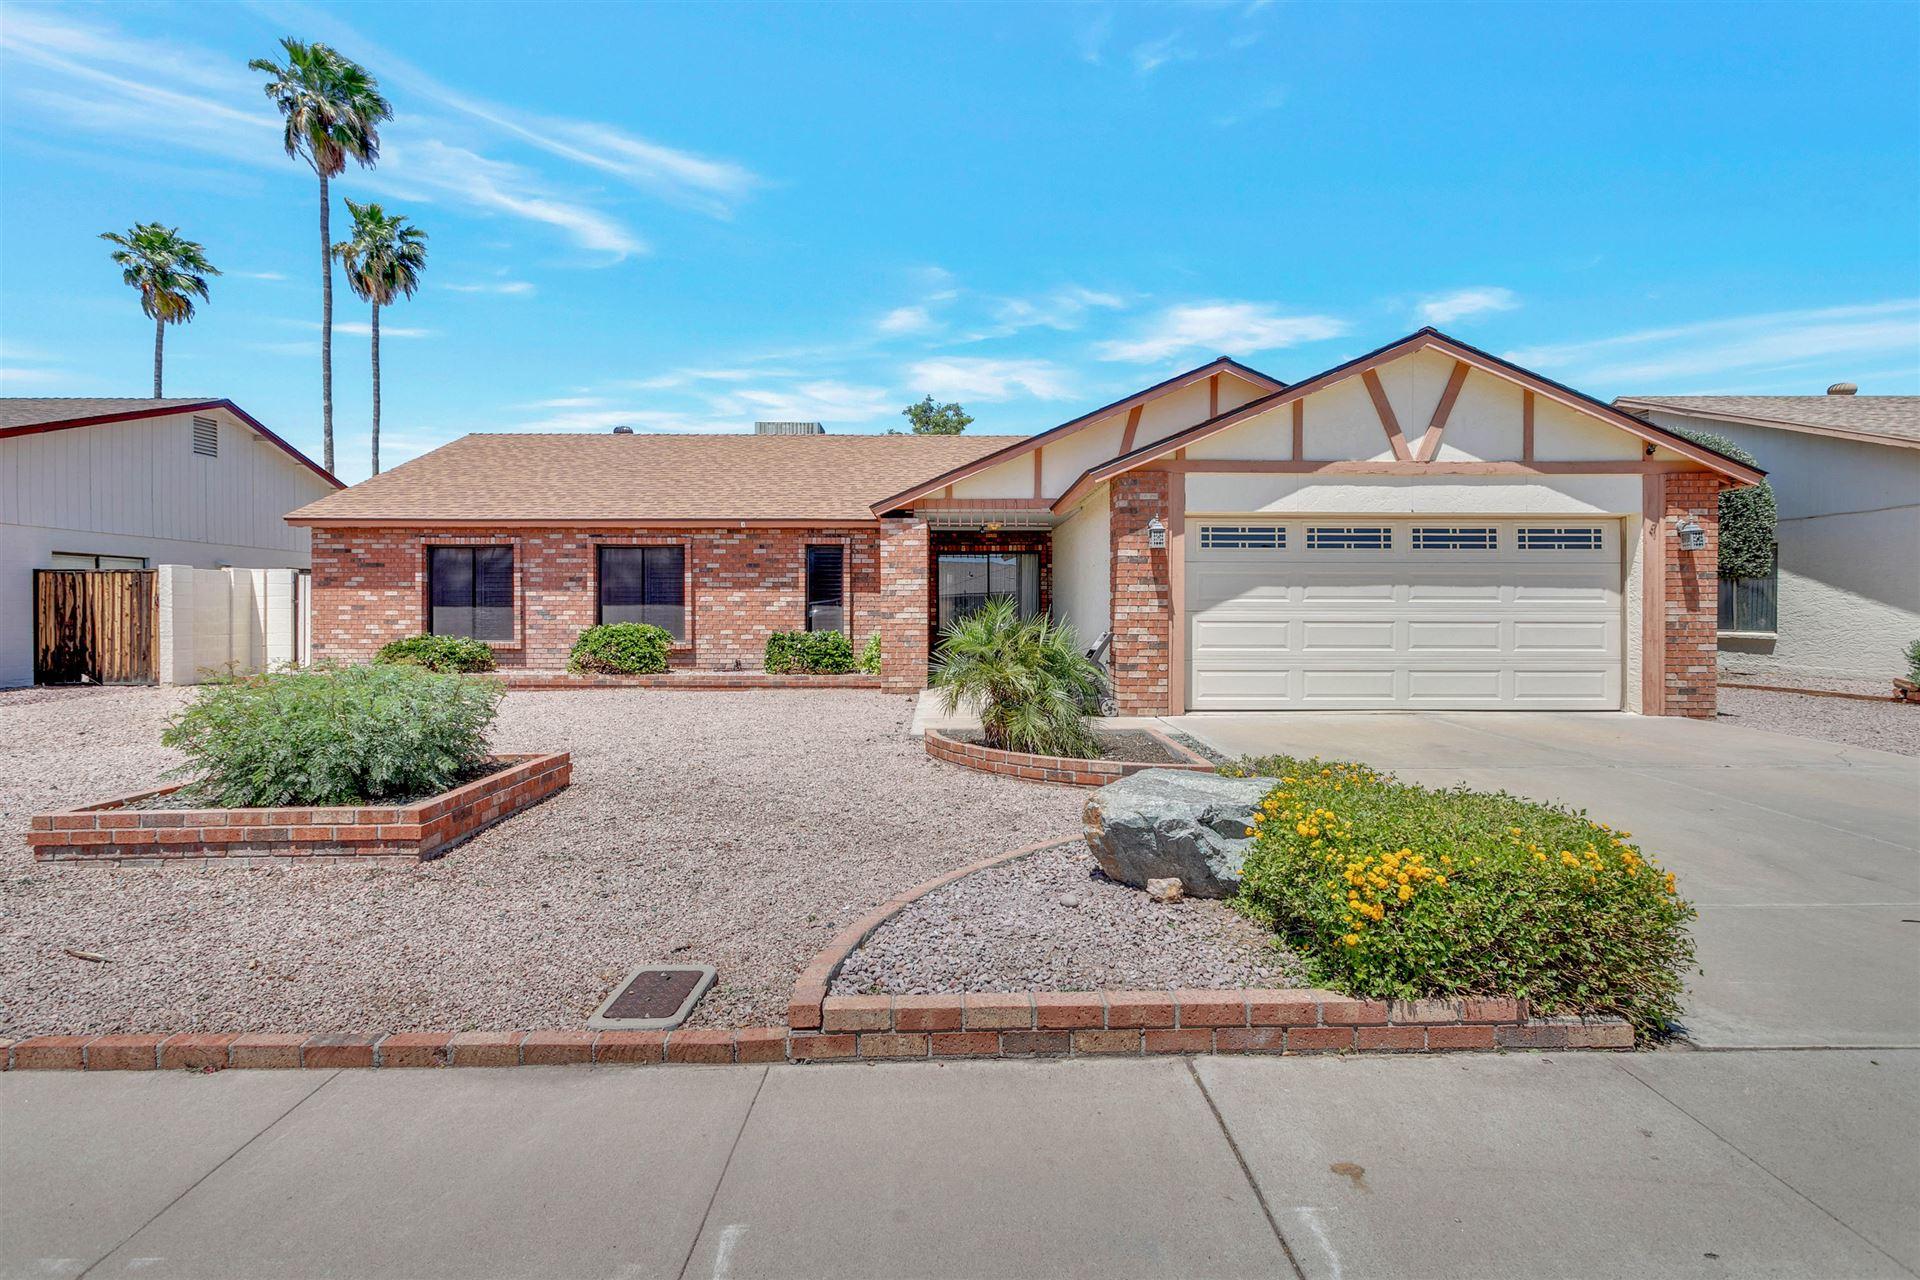 5514 W Beryl Avenue, Glendale, AZ 85302 - #: 6232515